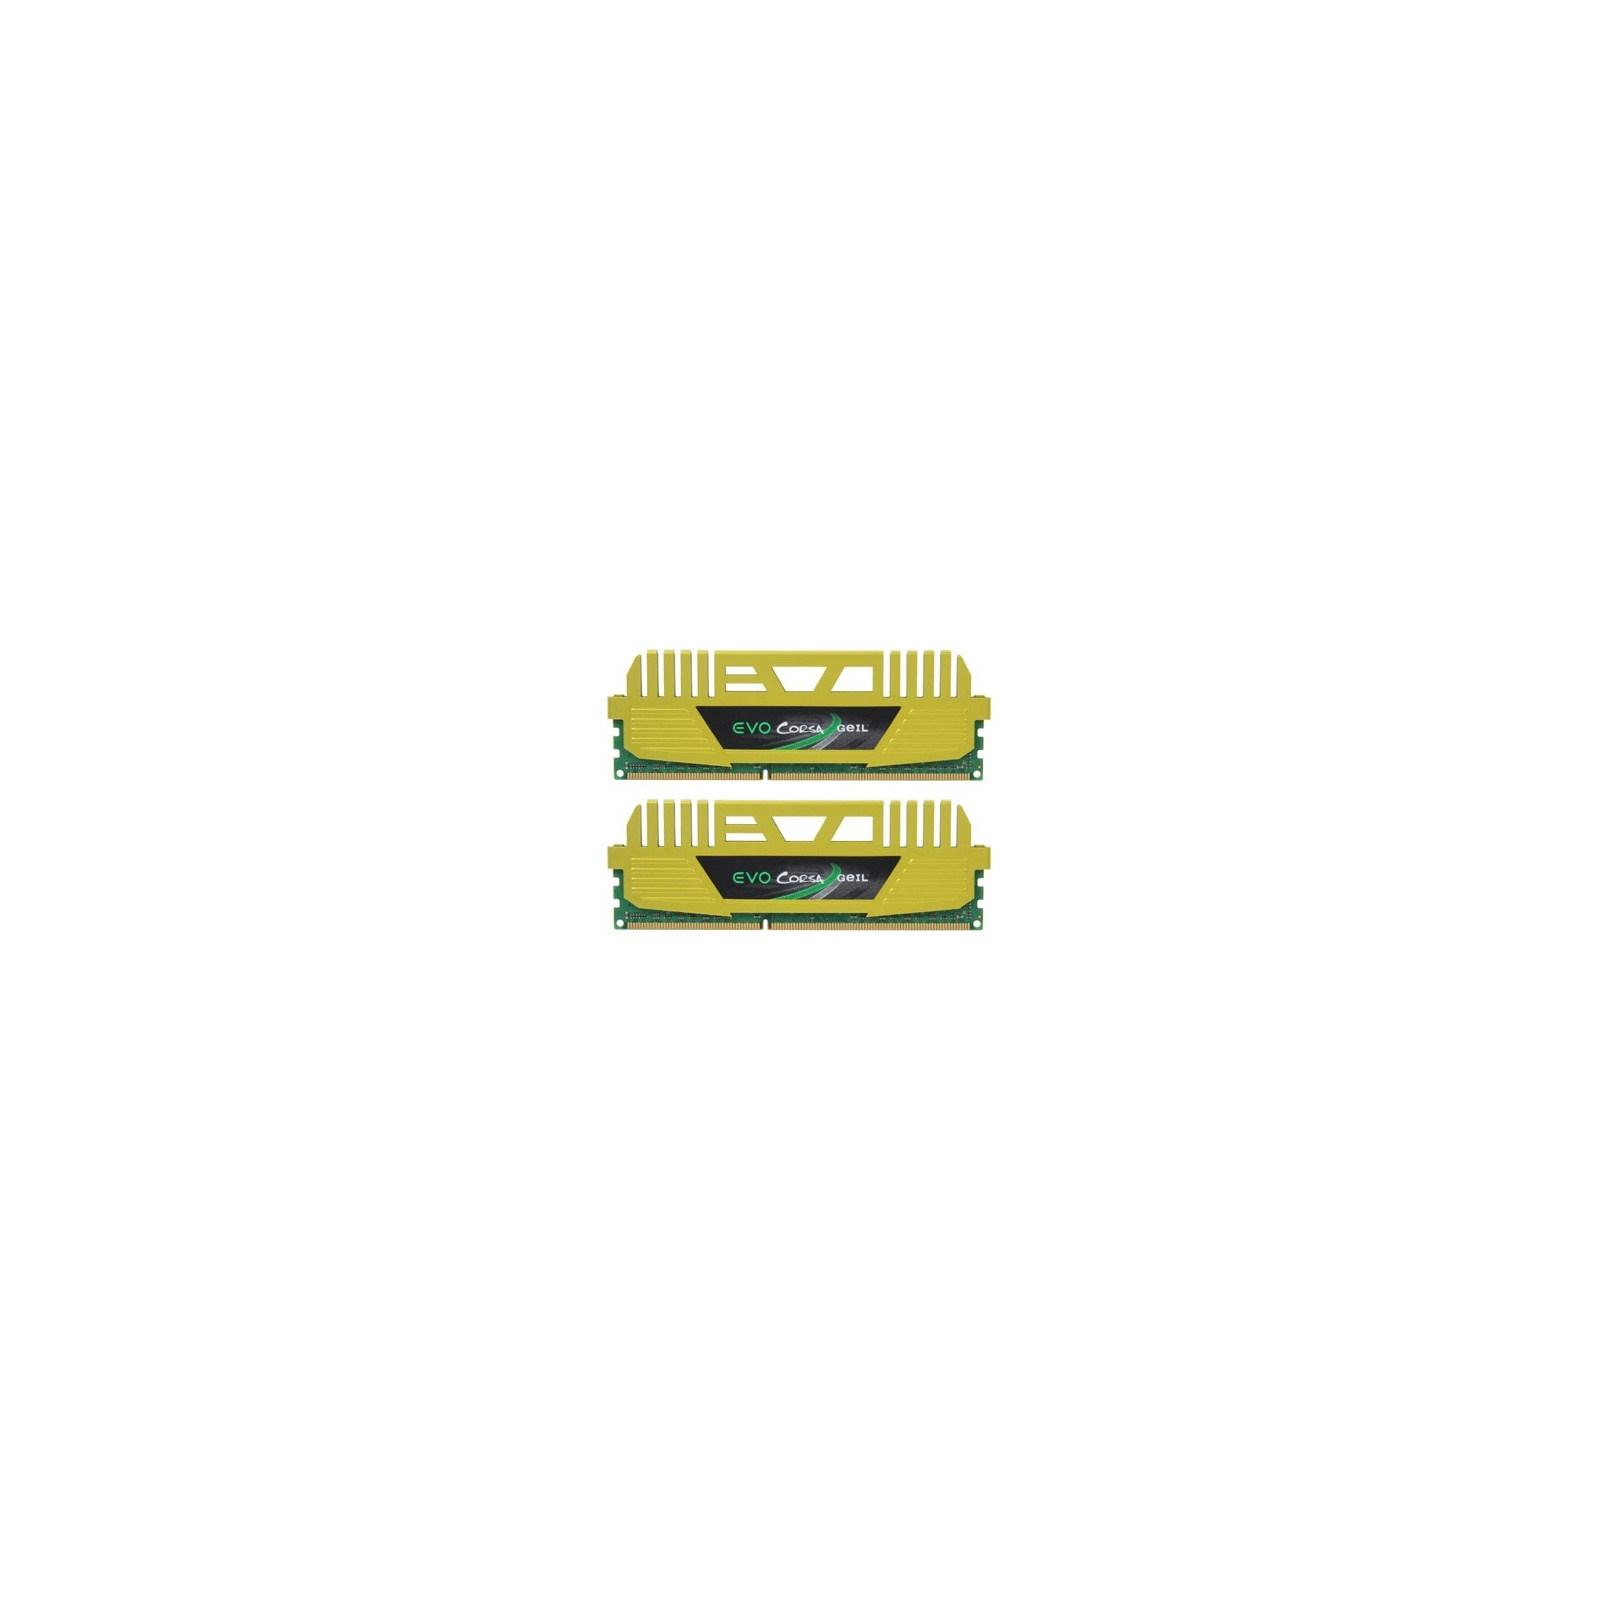 Модуль памяти для компьютера DDR3 16GB (2x8GB) 2133 MHz GEIL (GOC316GB2133C11DC)